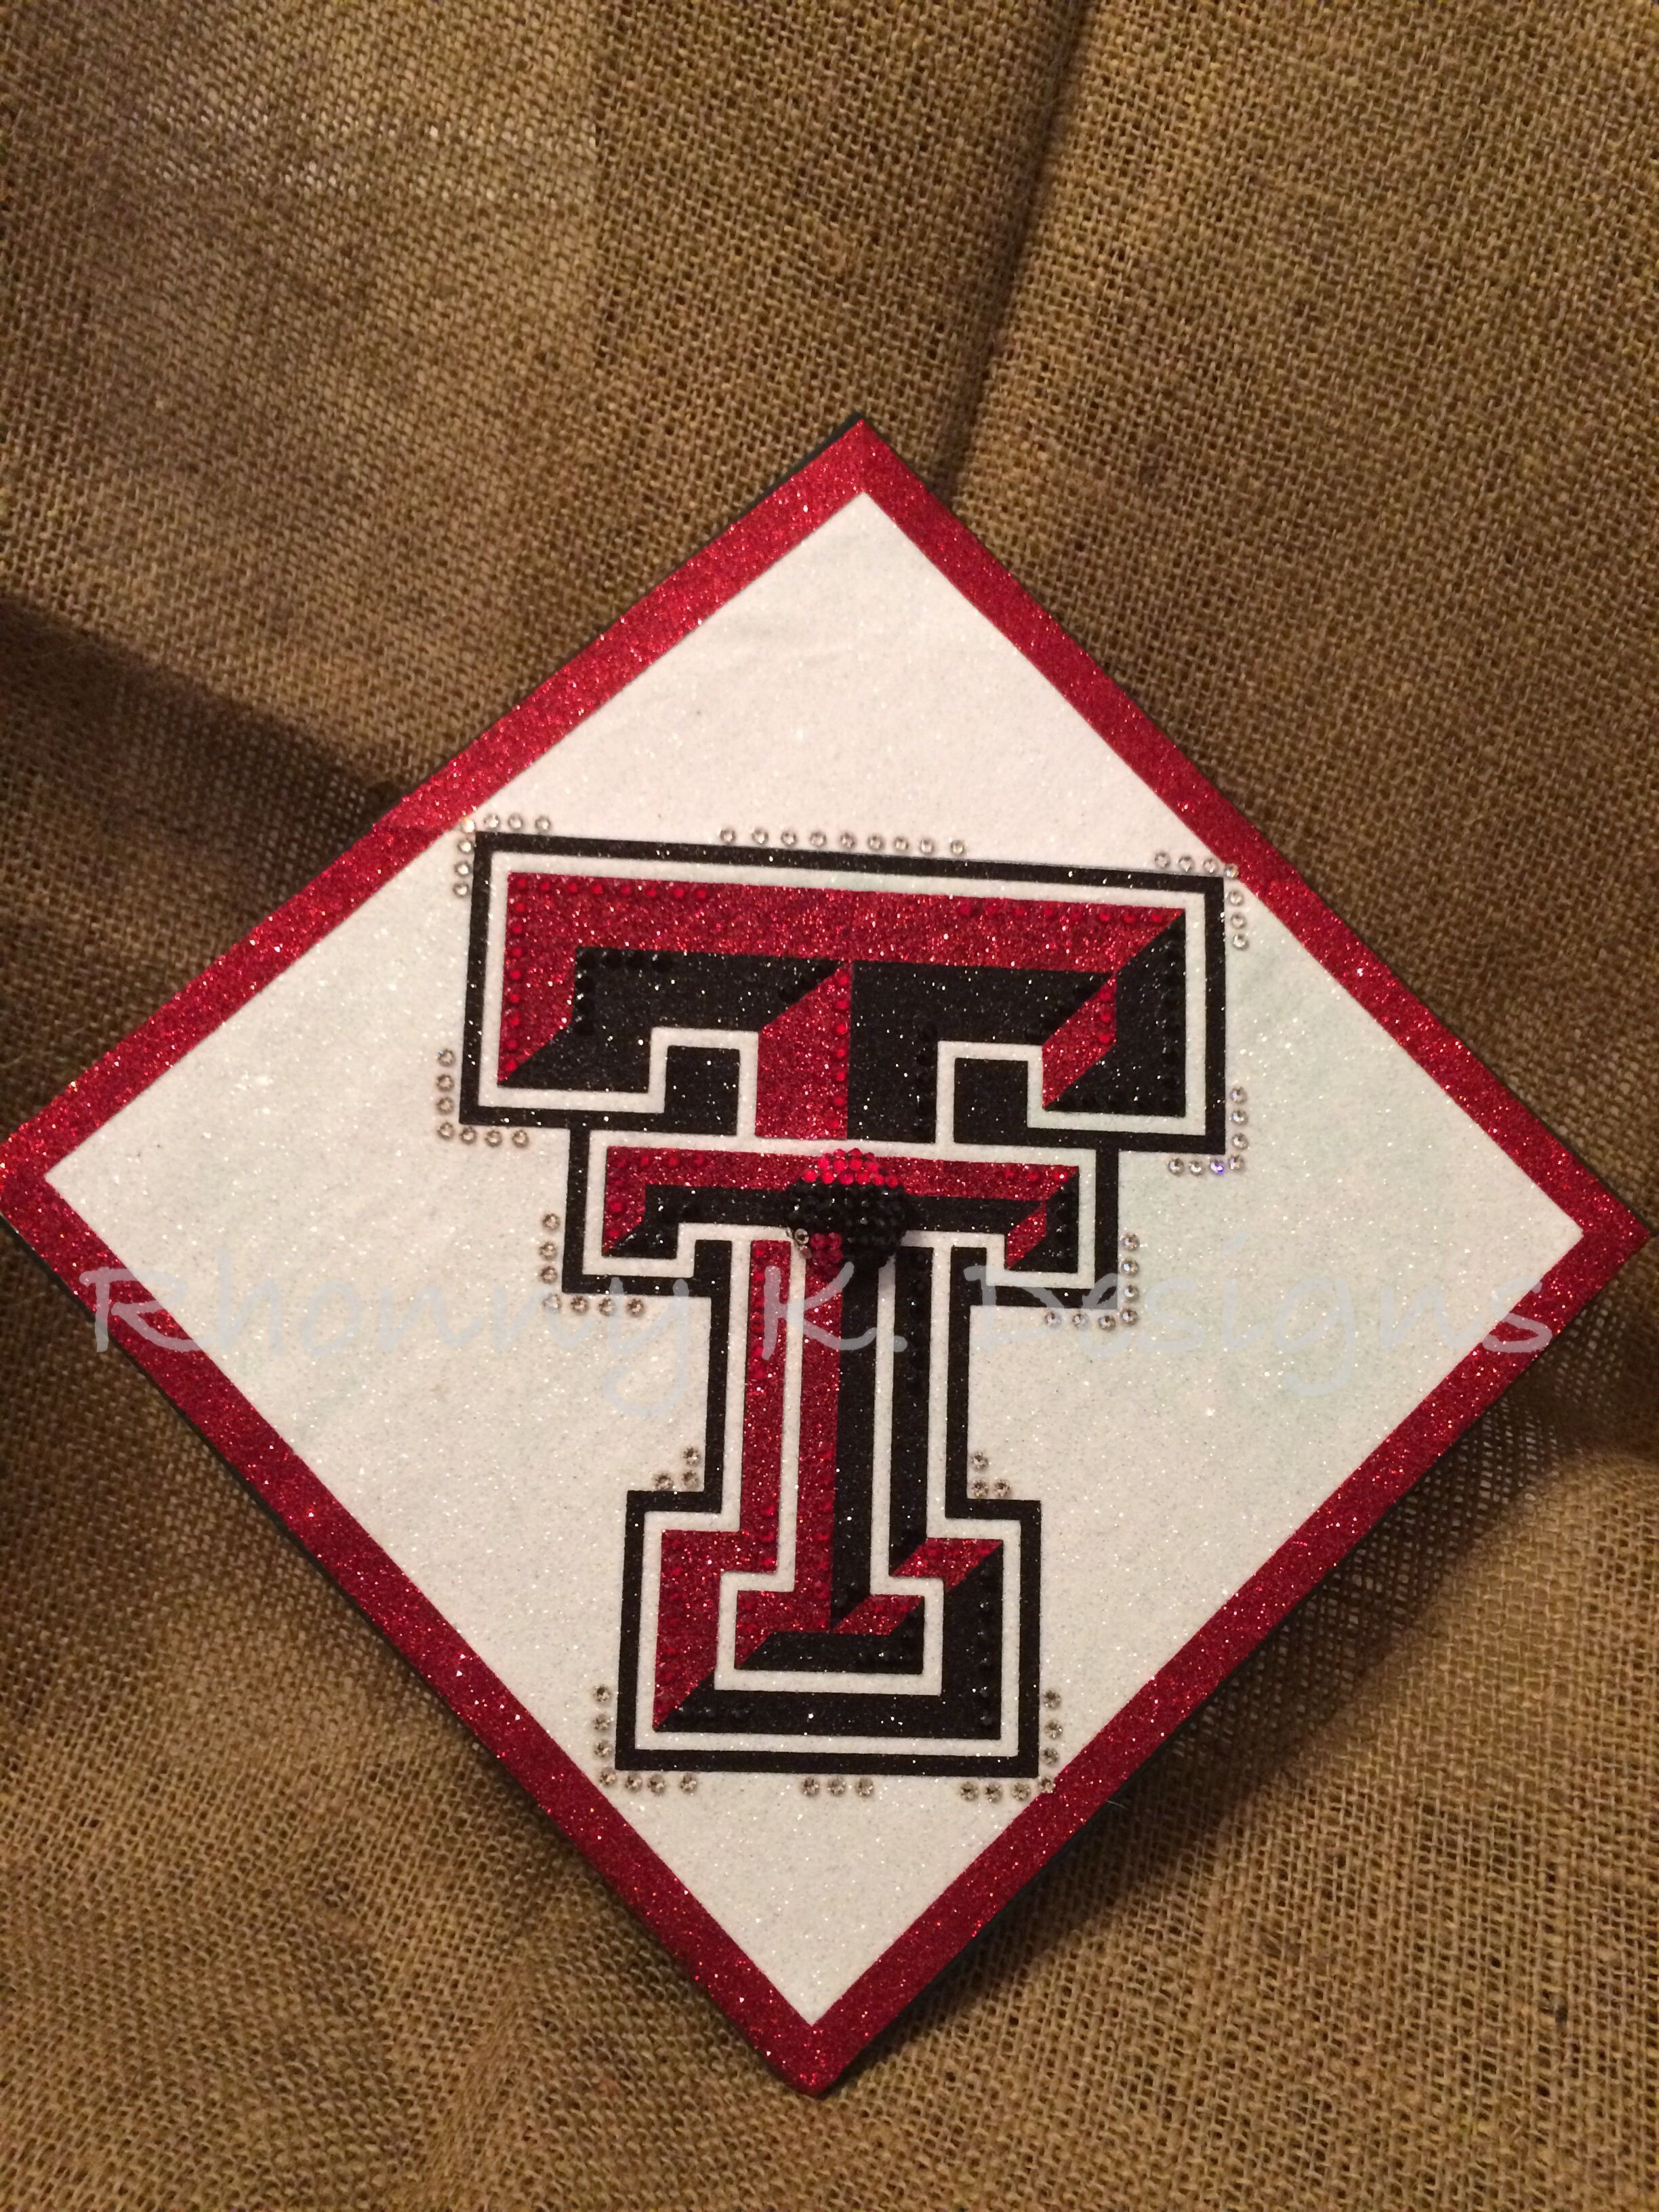 differently ac5de 70d5b Texas Tech custom decorated Mortarboard by Rhonny K. Designs. Mortarboard,  graduation cap, bling, Swarovski, Texas Tech, Red Raiders, Seniors  Rhonnyk.com ...